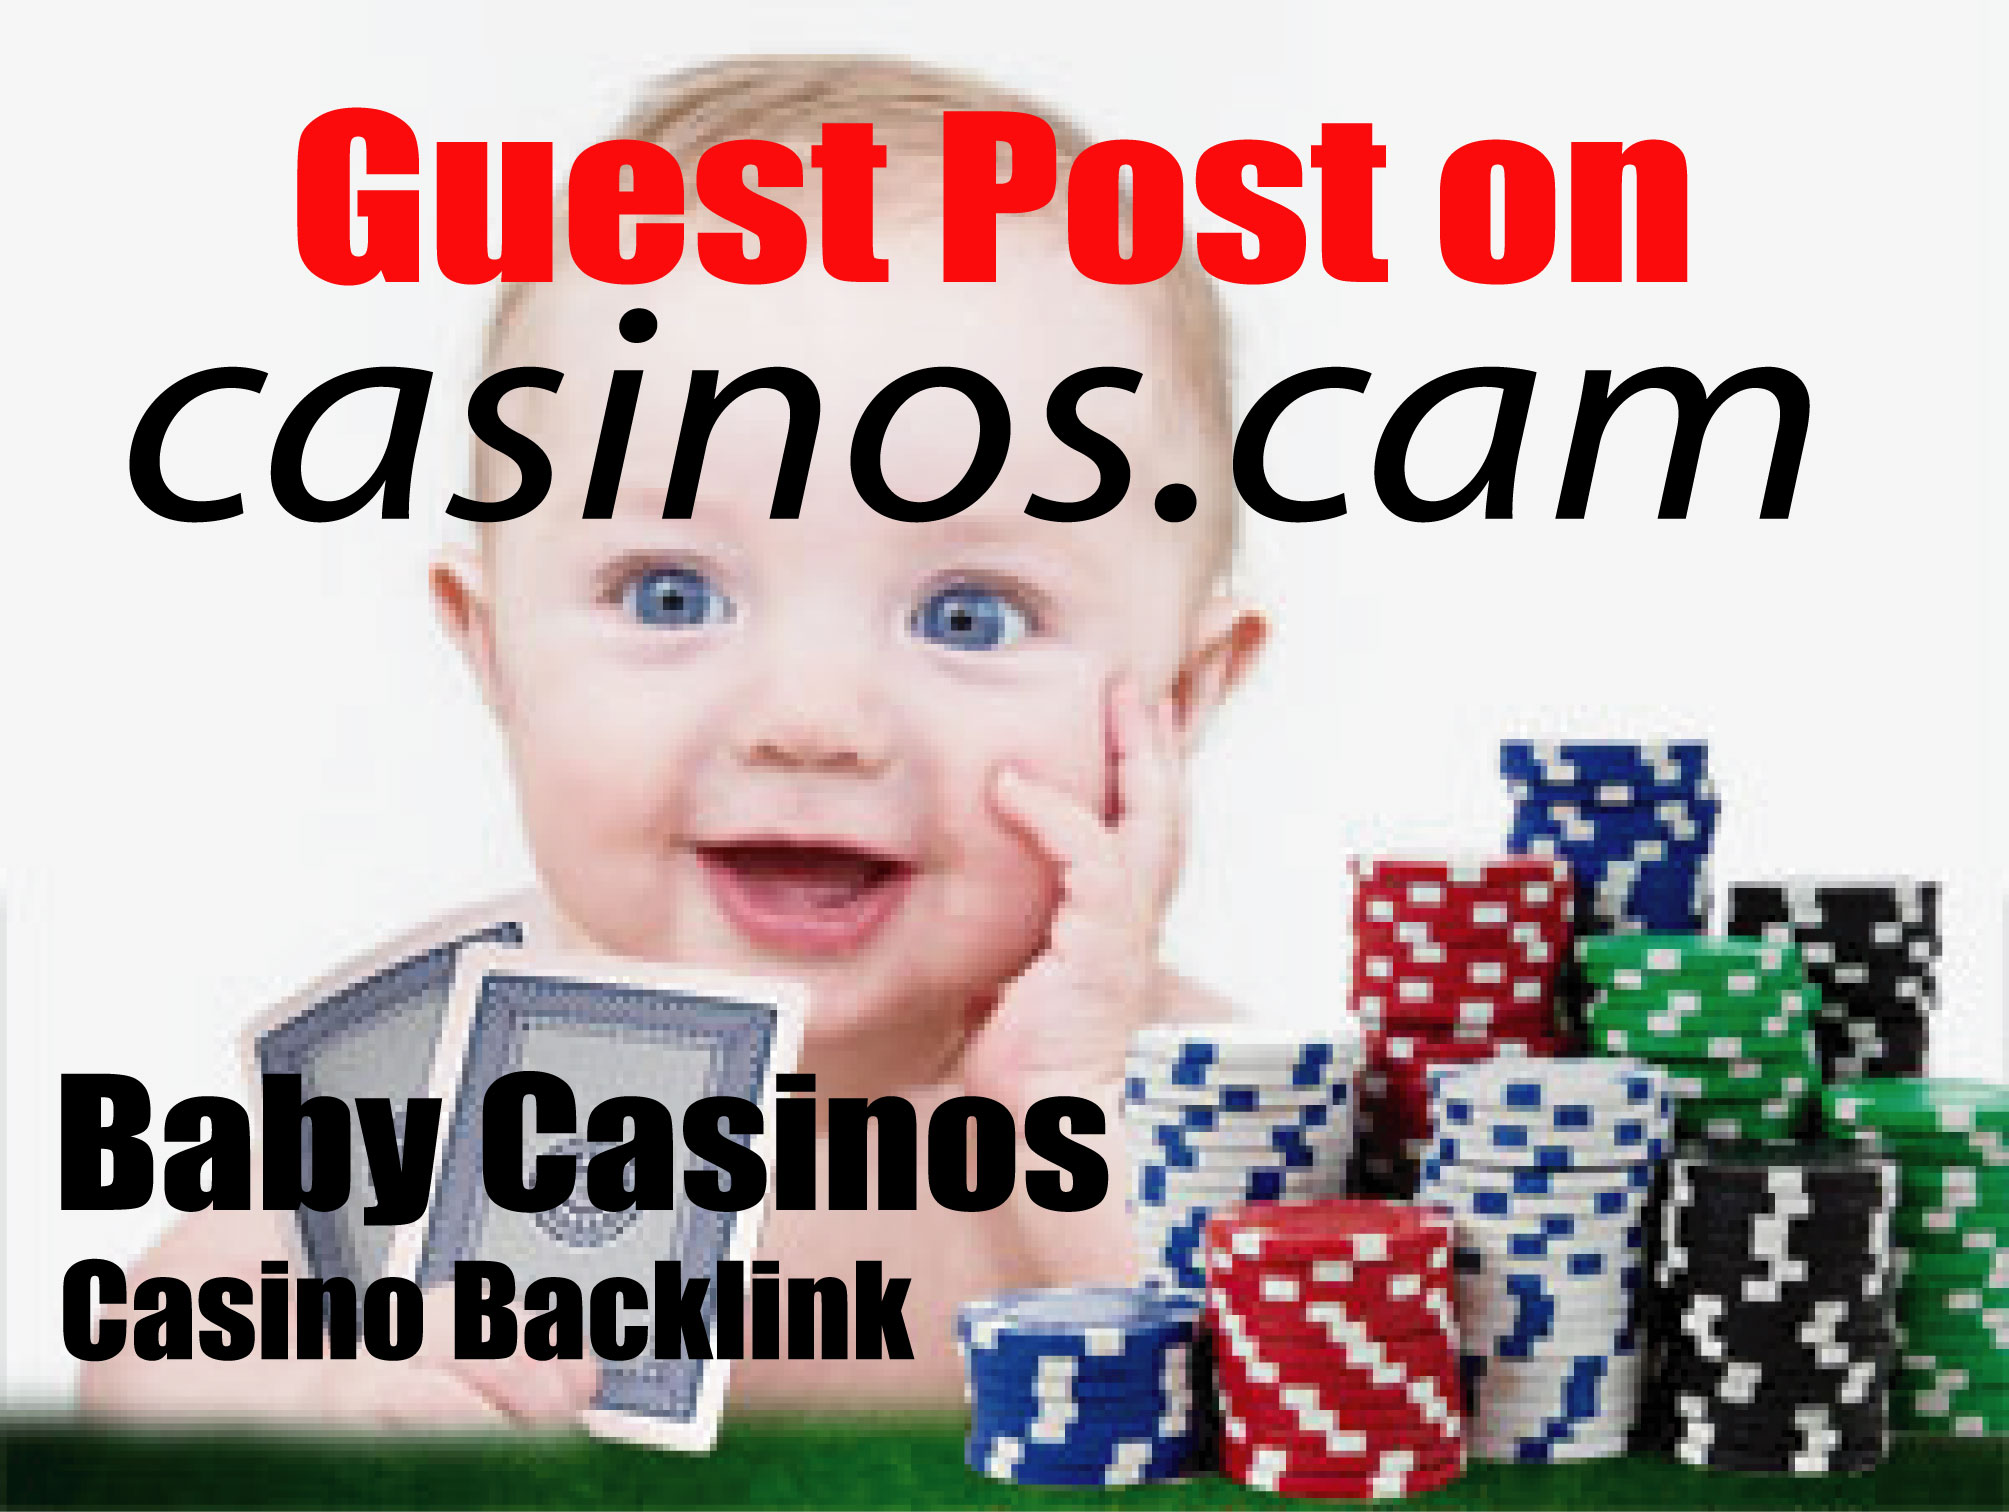 I Will Manually create Baby Casinos 100 Backlink Guest Post on Casinos. cam,  Gambling,  Online